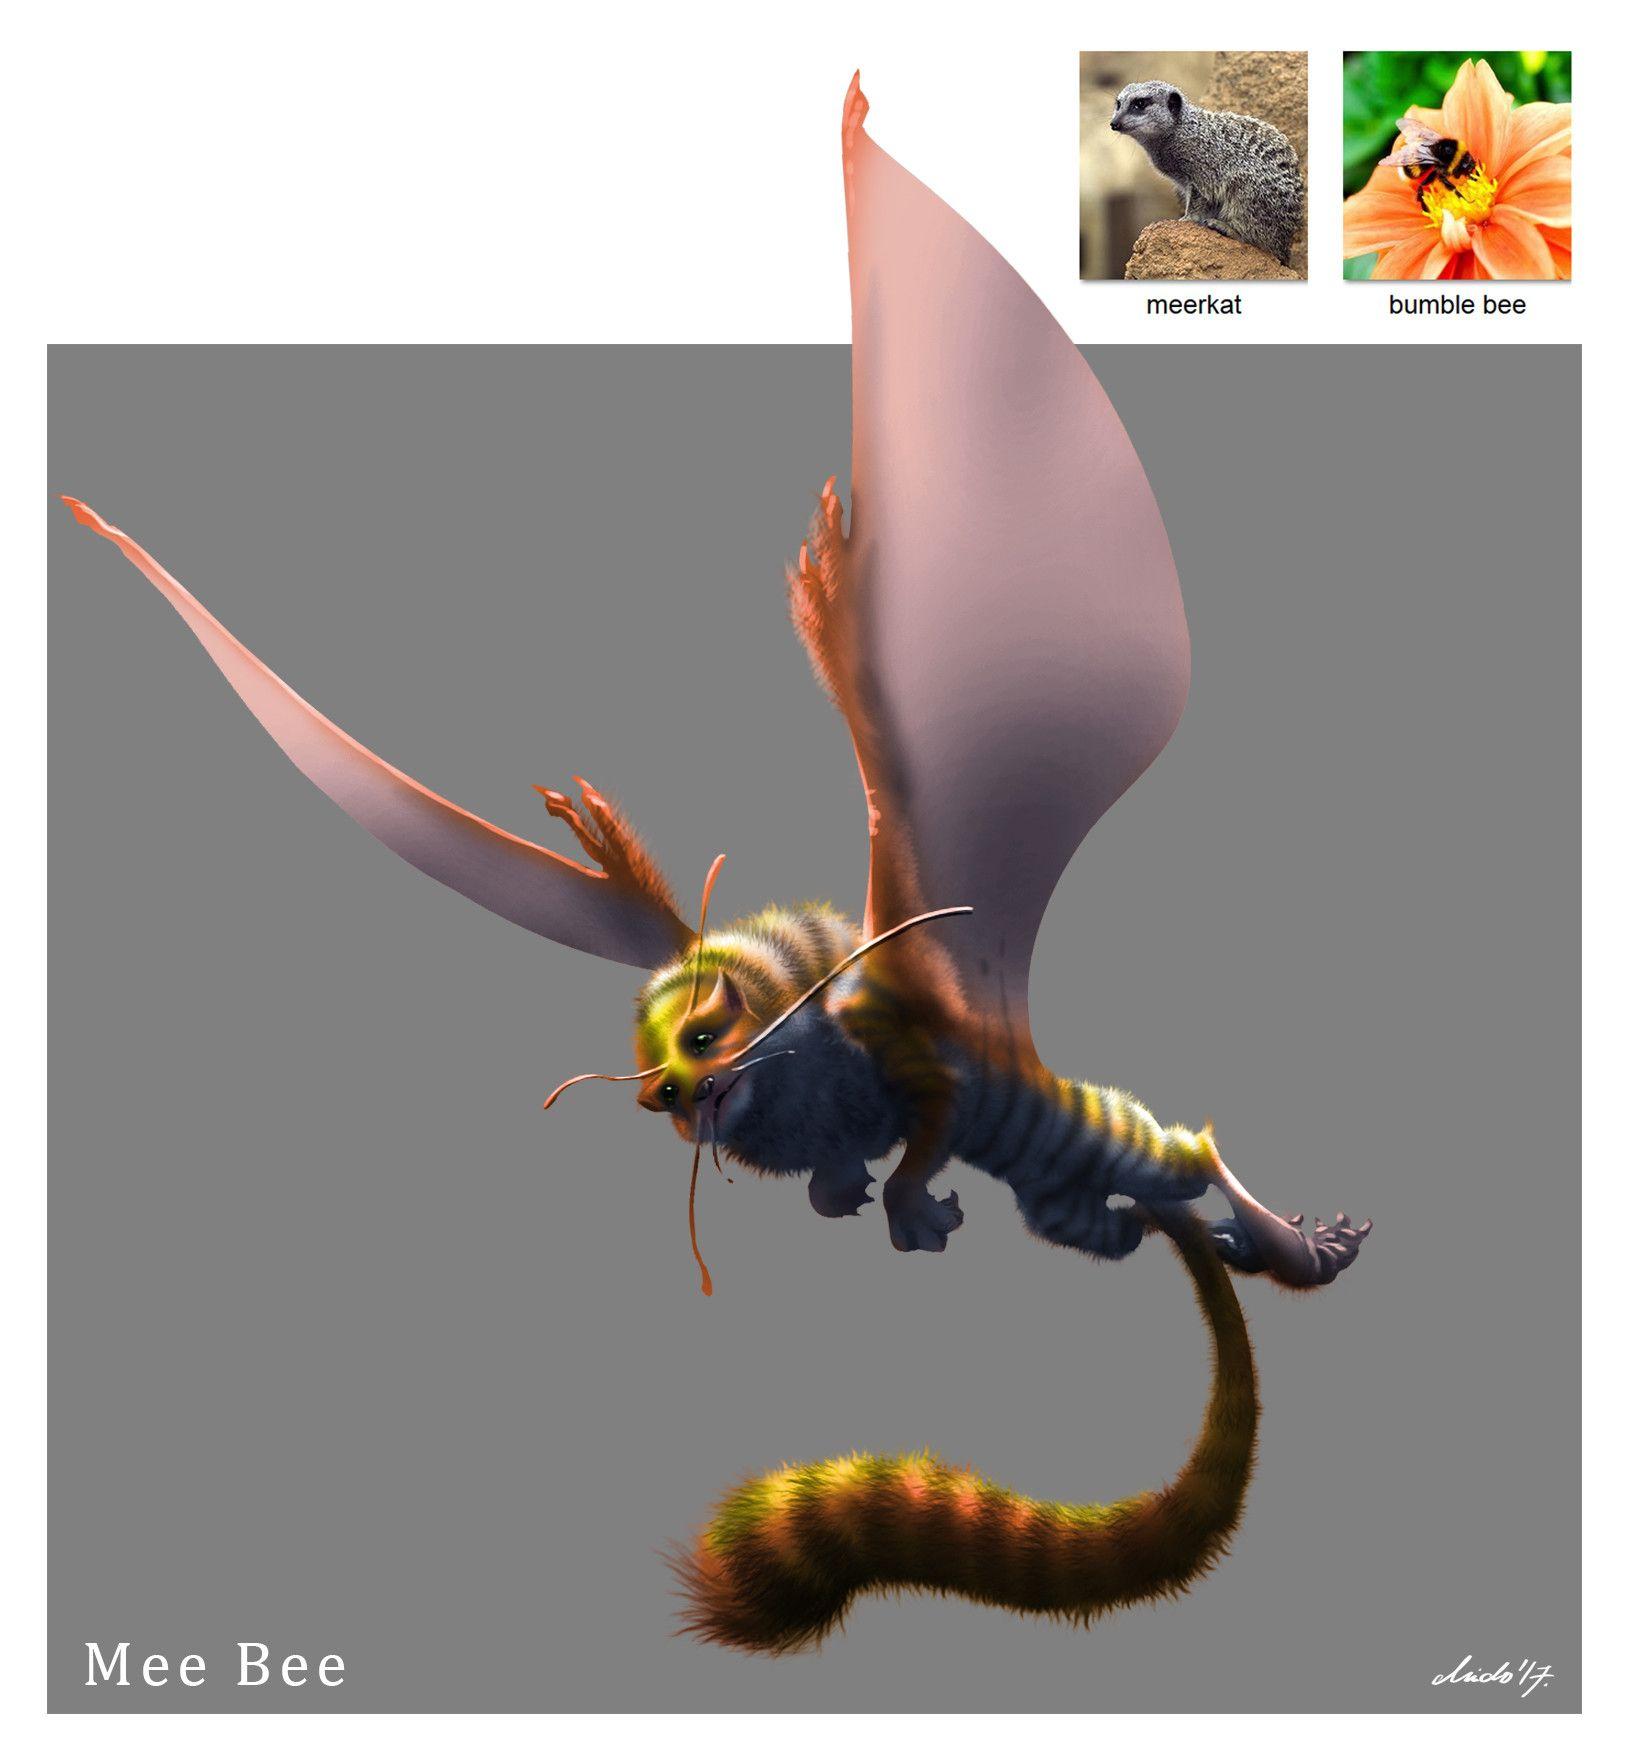 Artstation random creature mashup project 034 mee bee